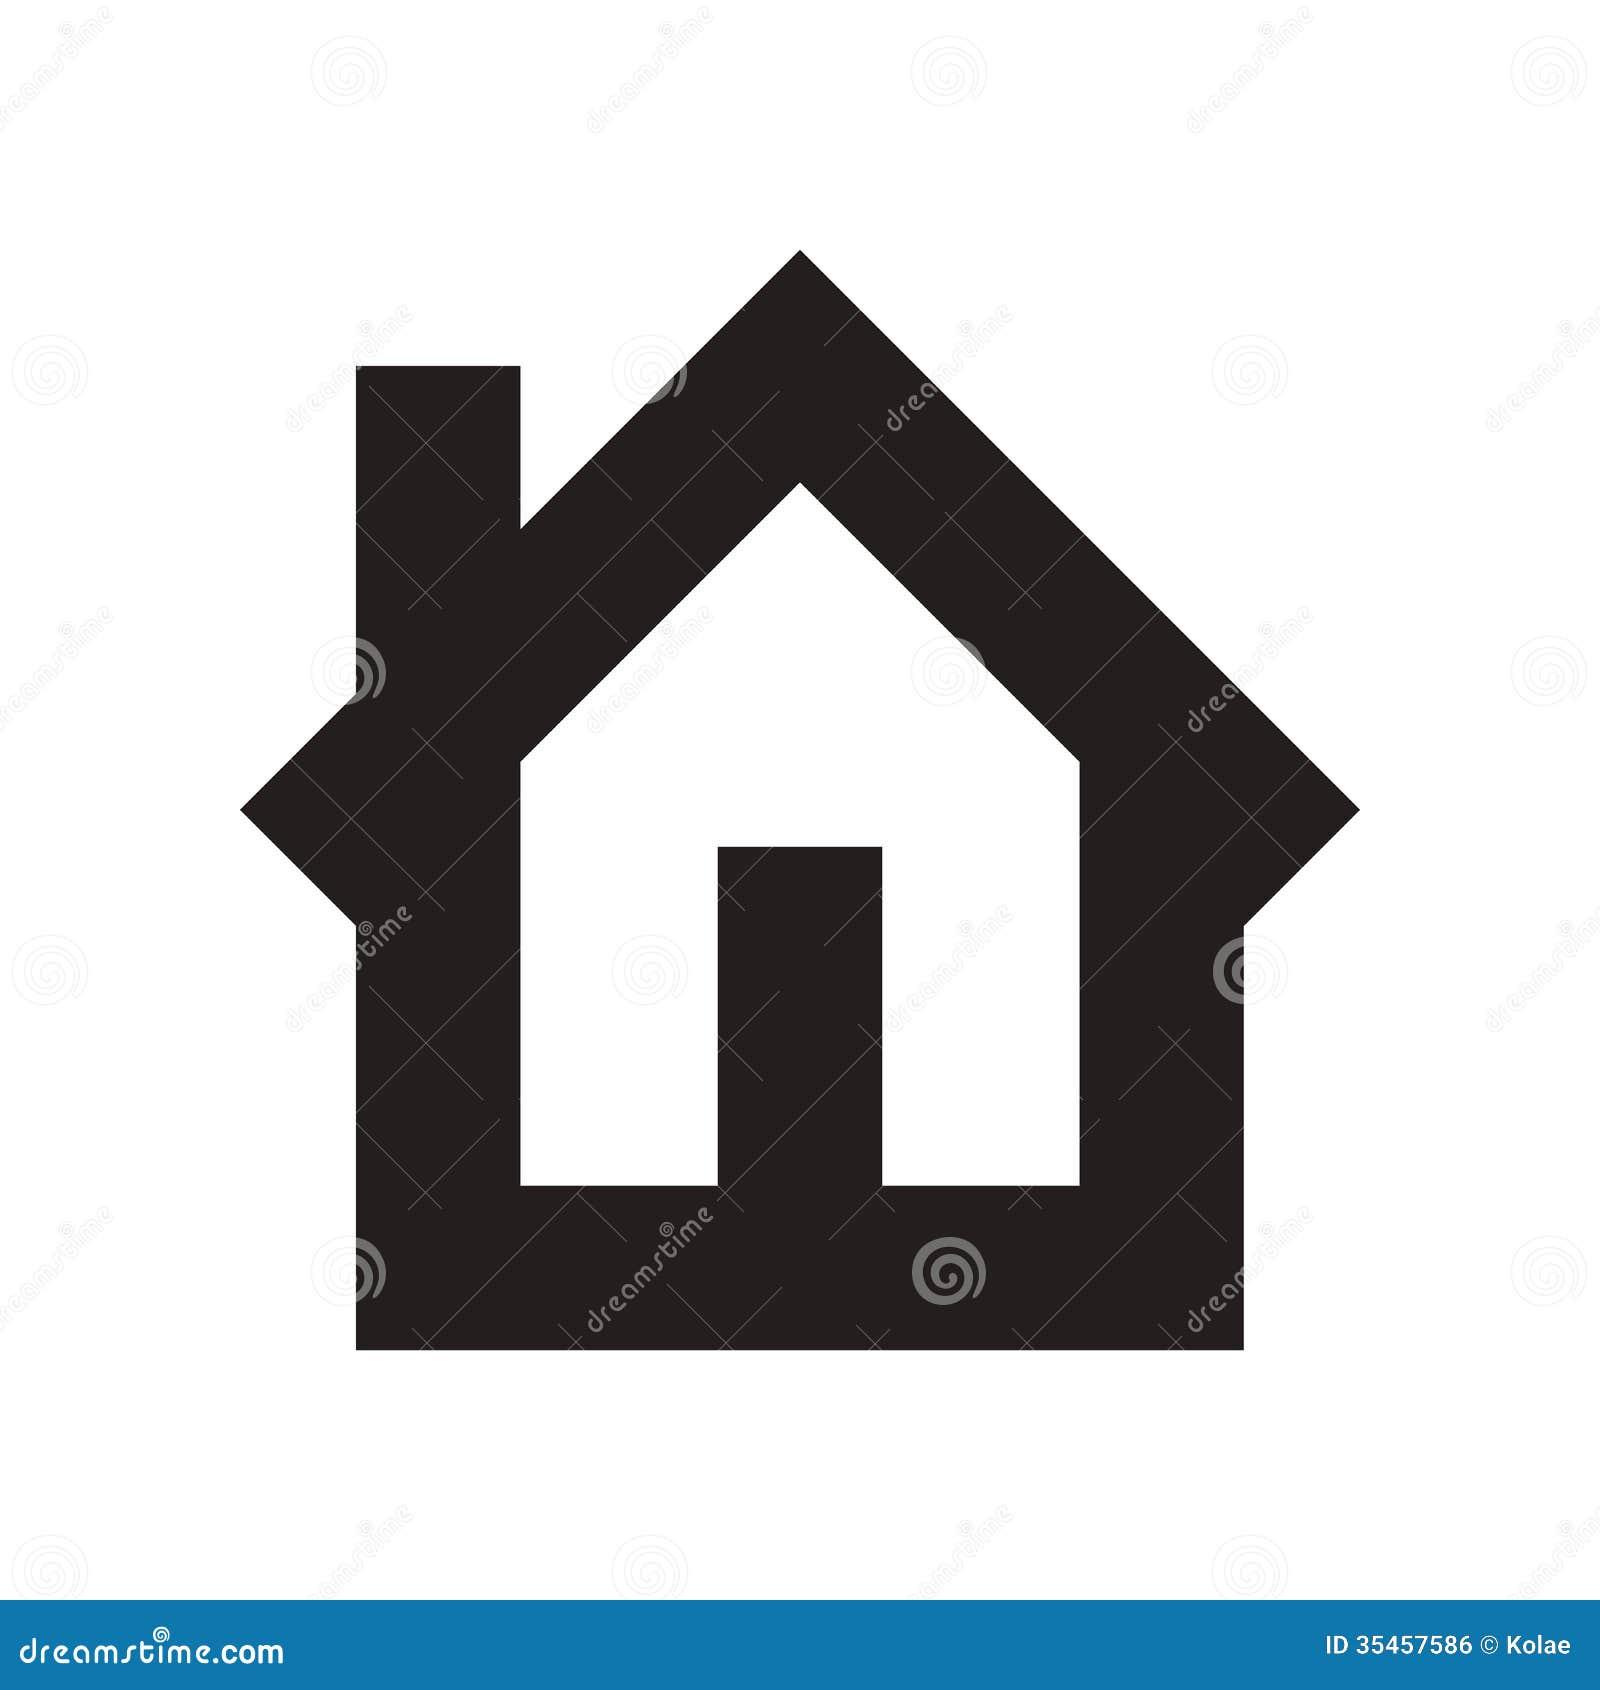 Home Symbol Royalty Free Stock Image Image 35457586